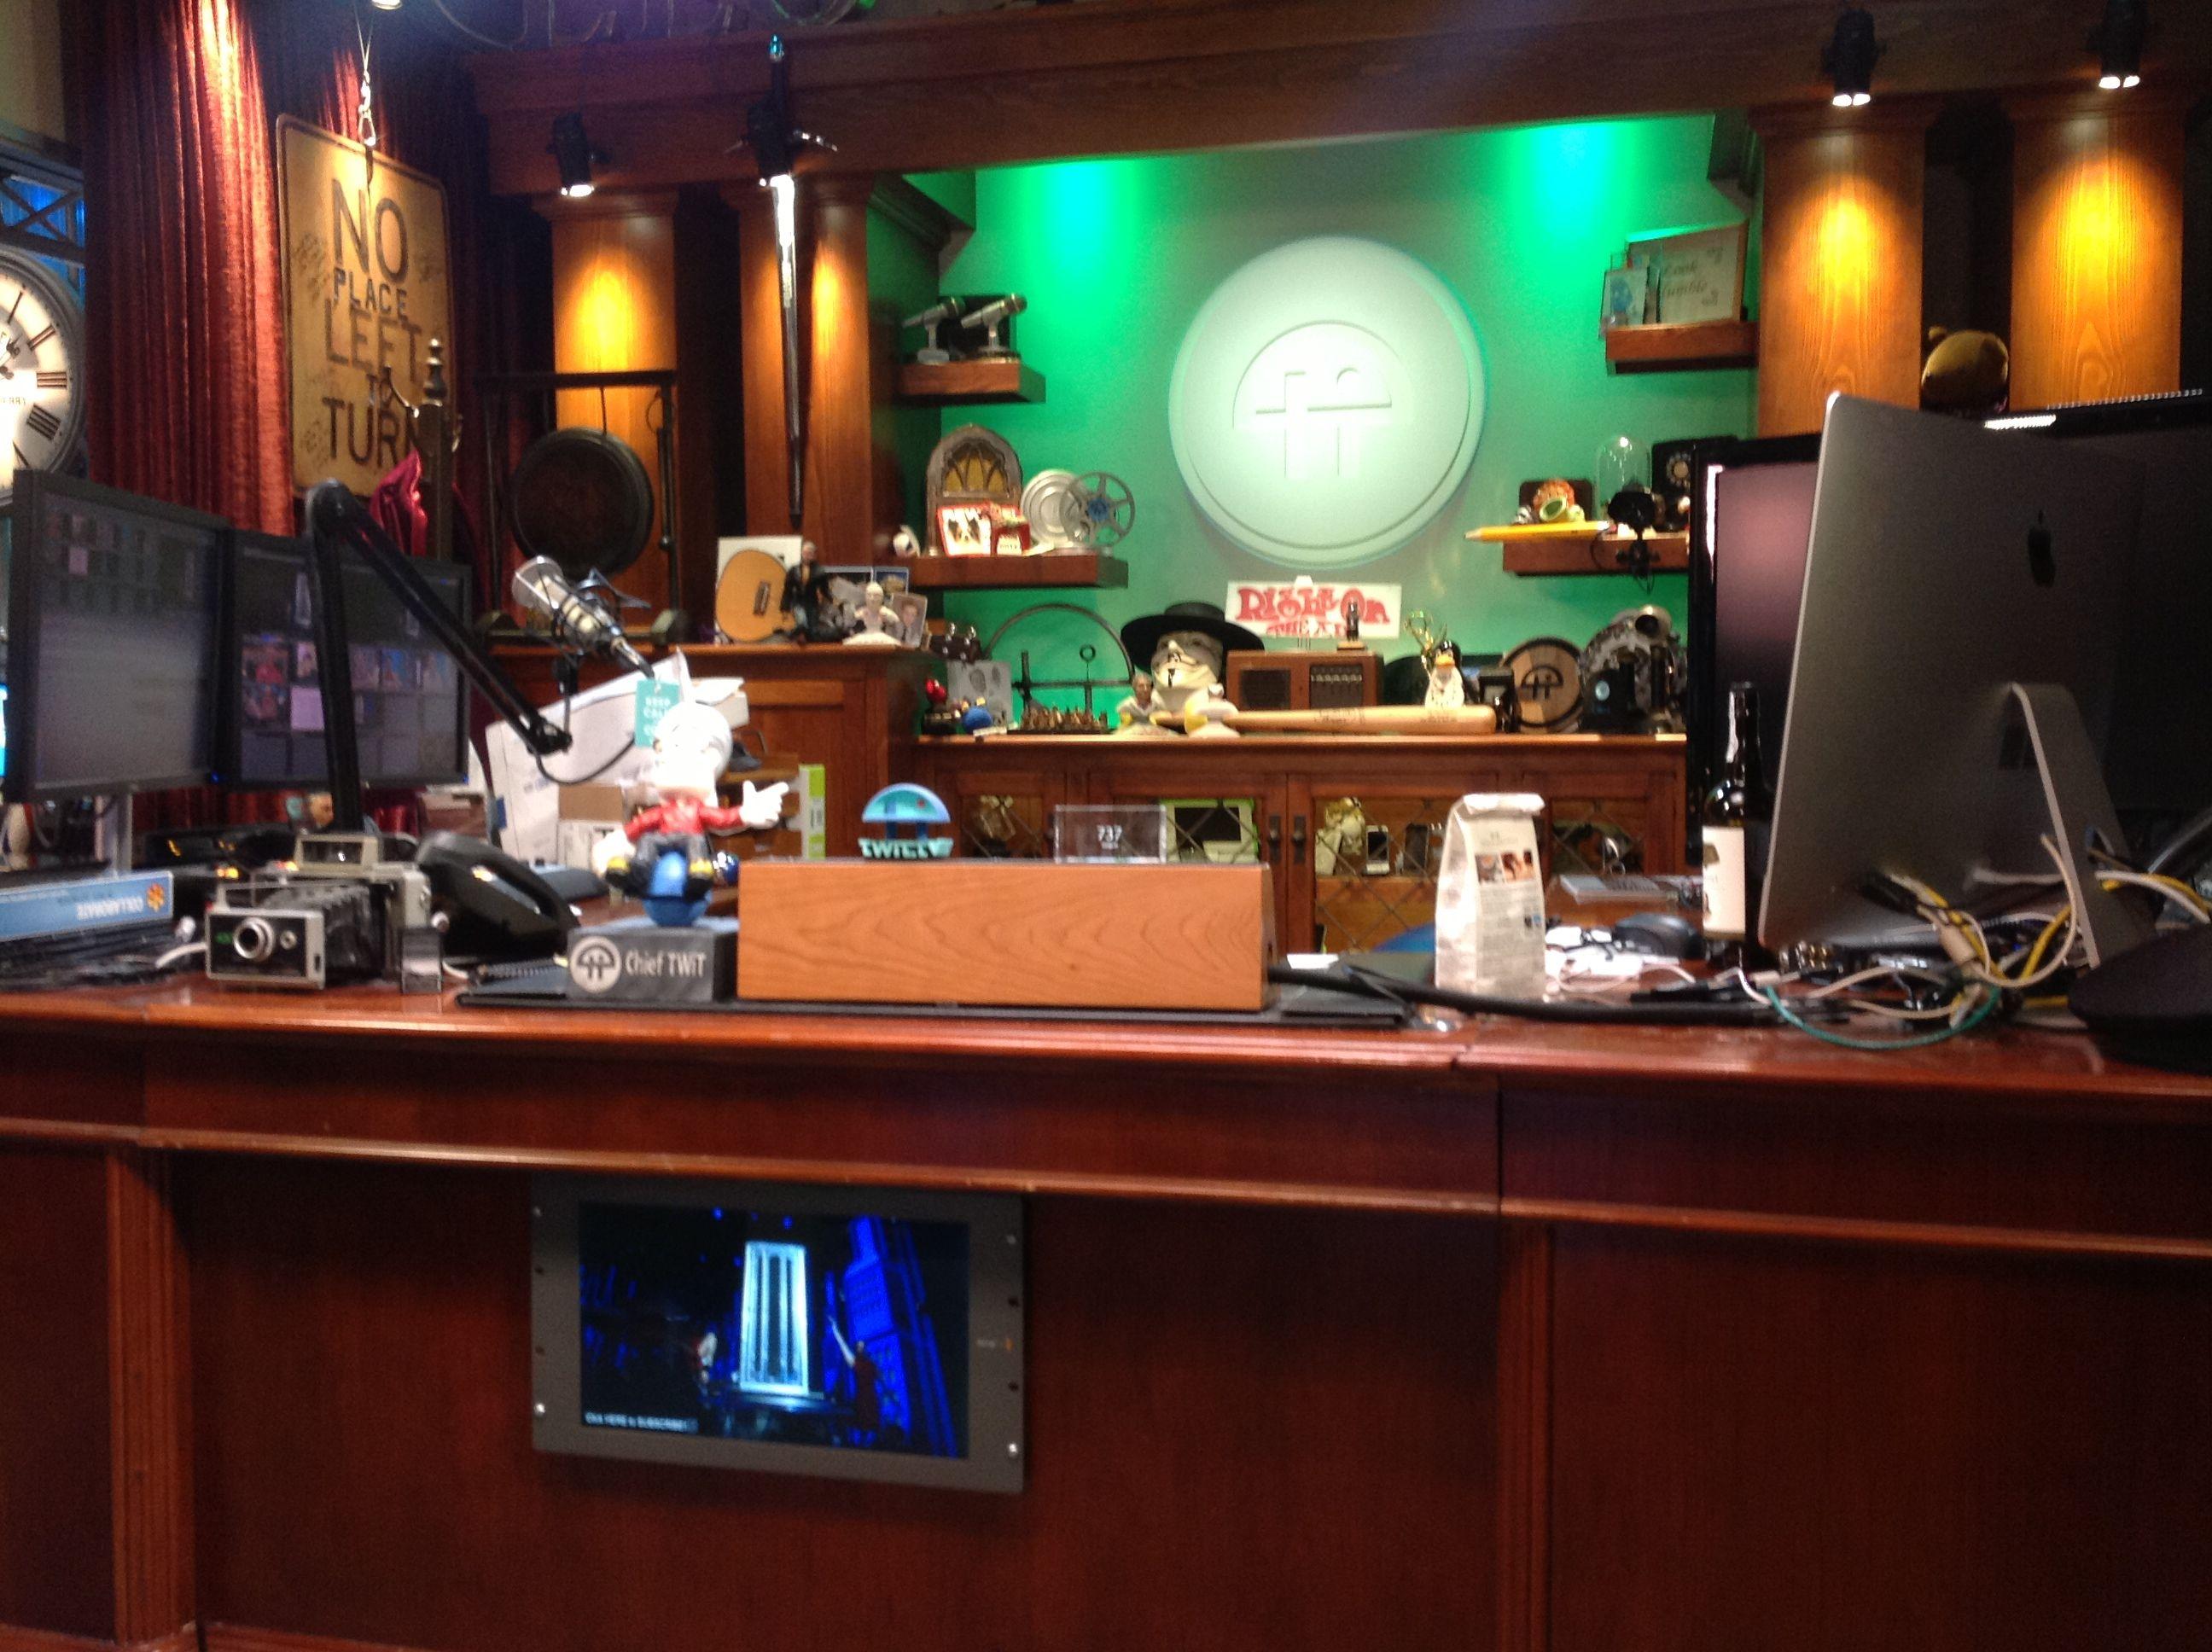 The twit.tv Brickhouse facility in Petaluma, CA, Leo Laporte's radio perch